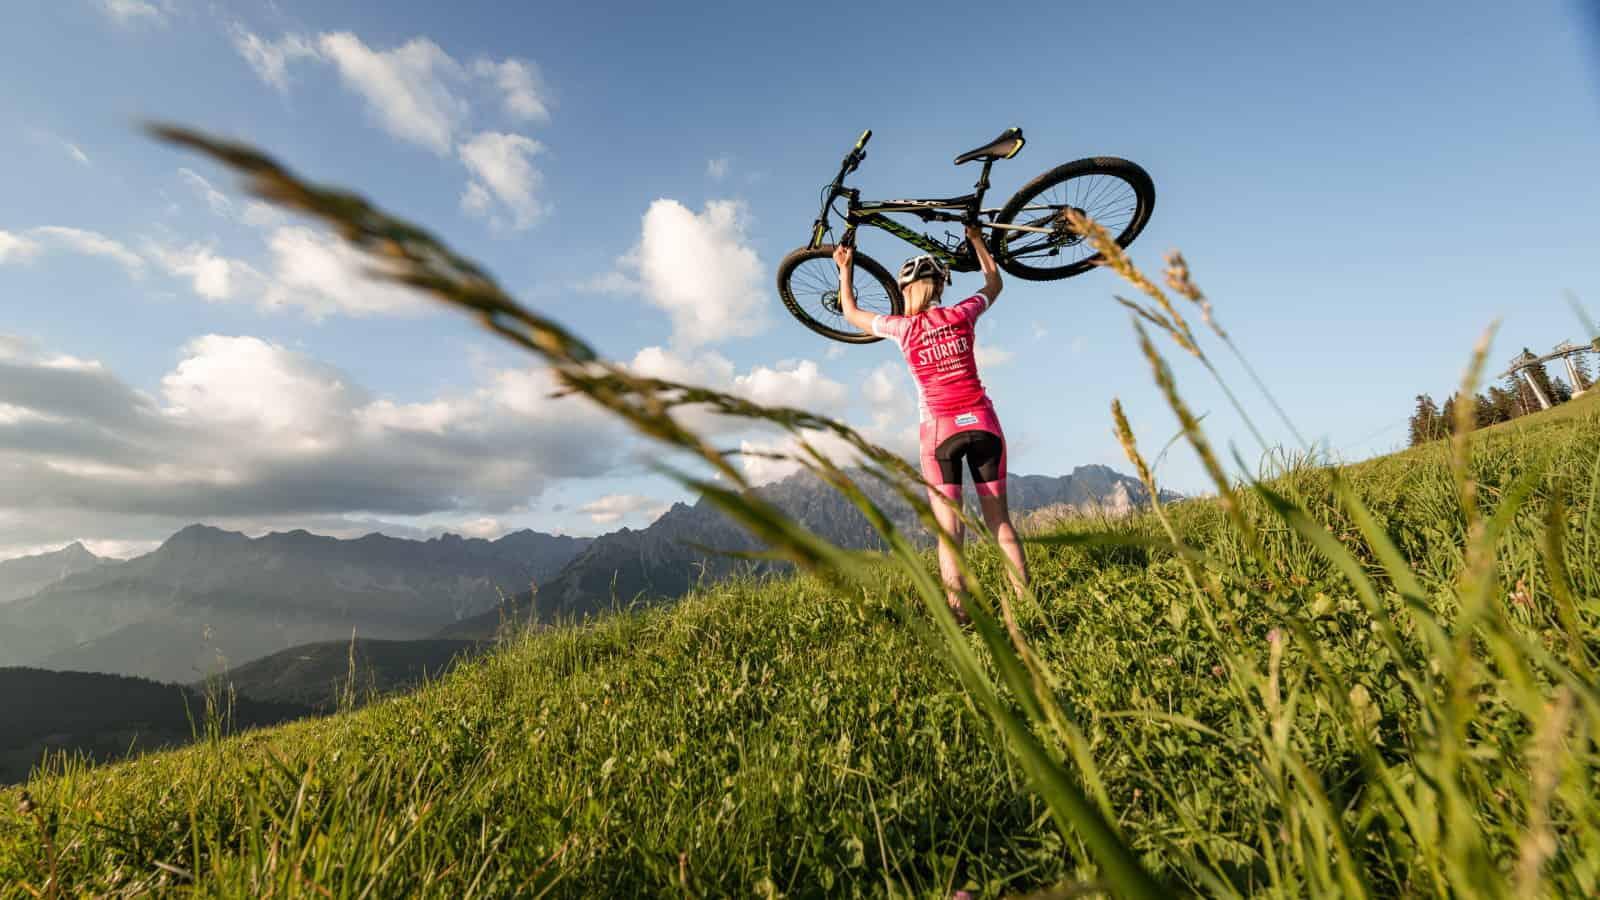 MTB vid Watzmann Hochkönig cykelsemester semester i Österrike